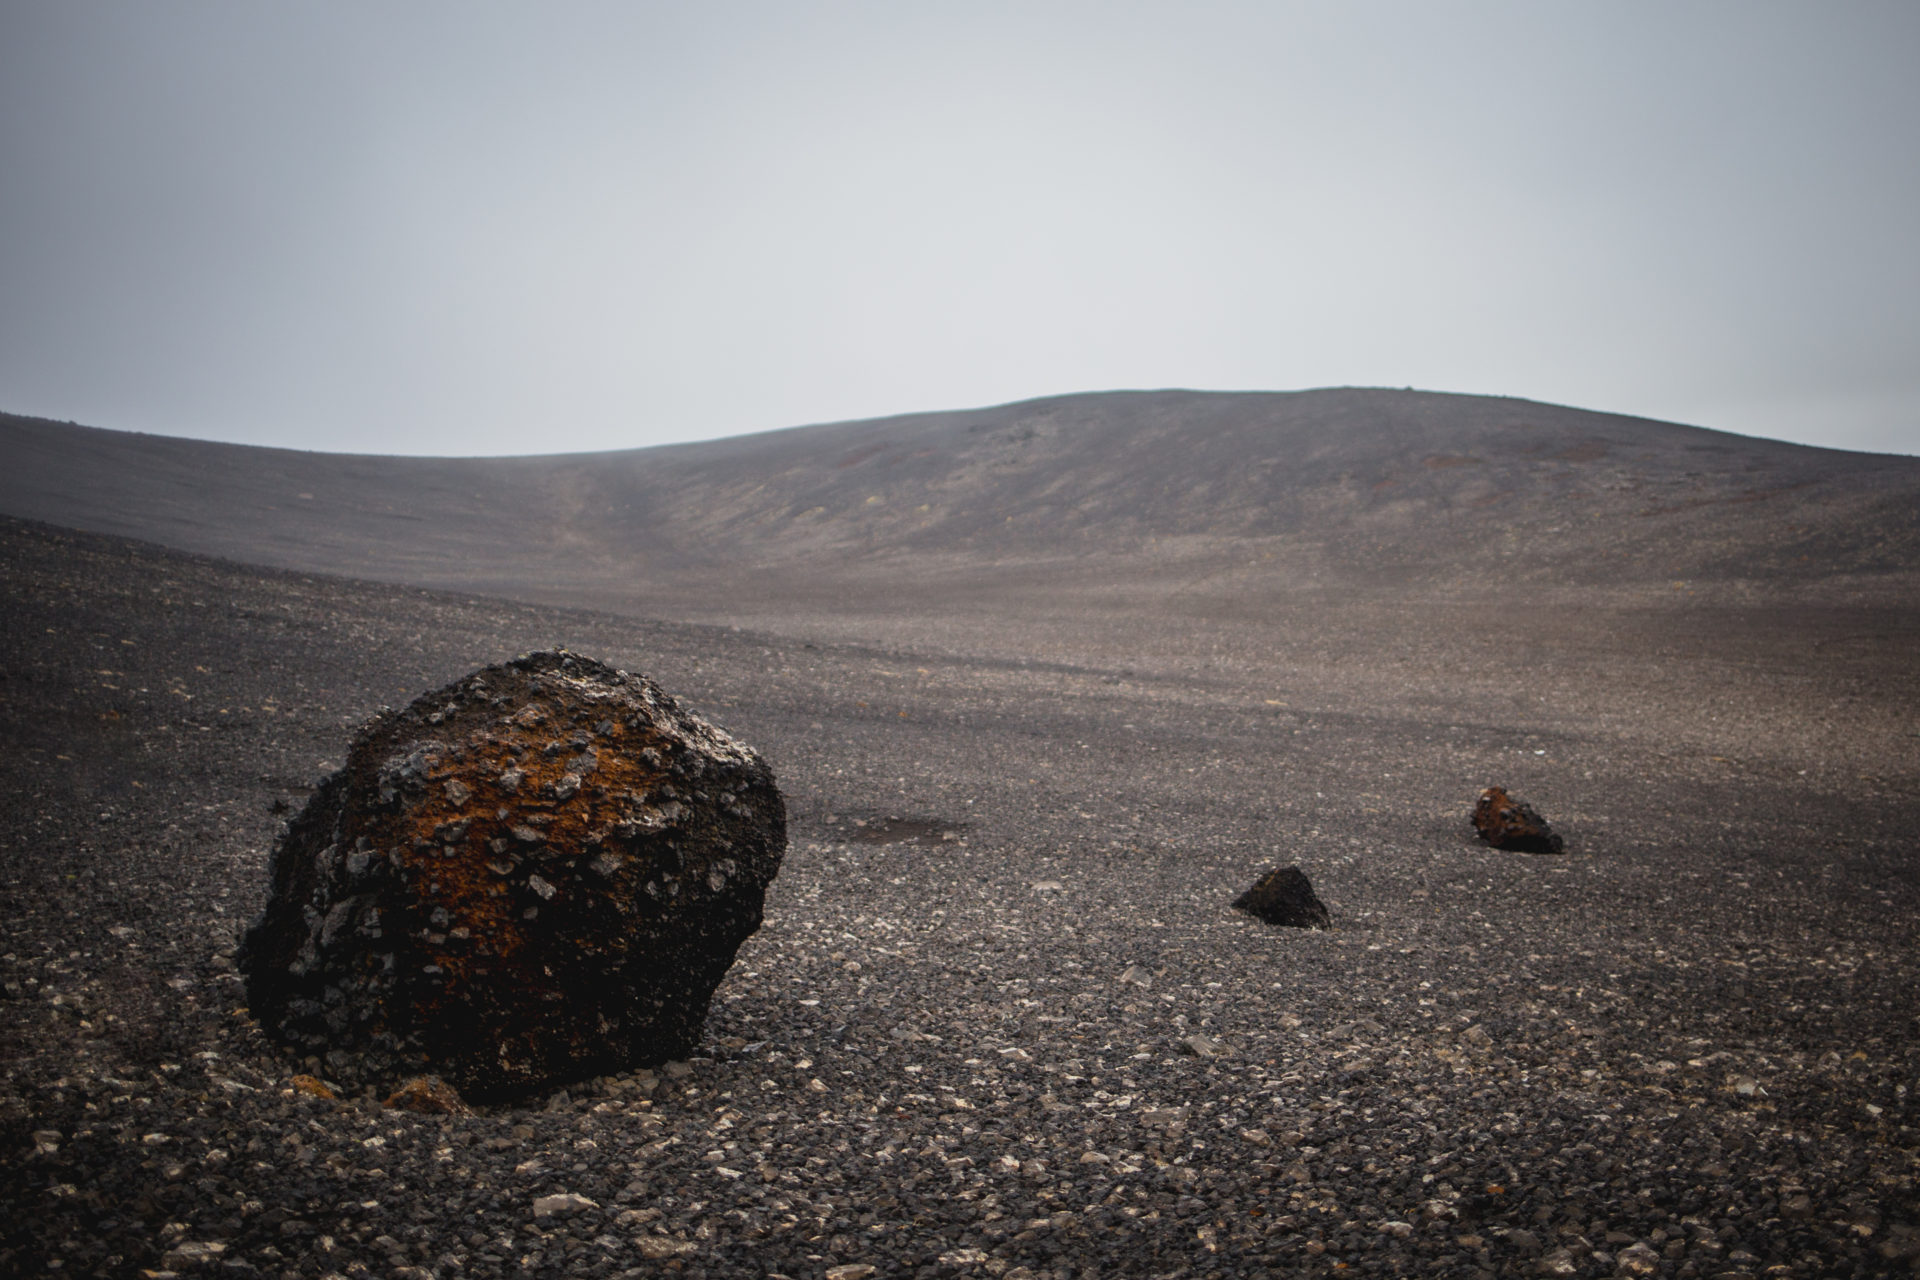 Island_Iceland_IMG_1666_Carolin-Weinkopf